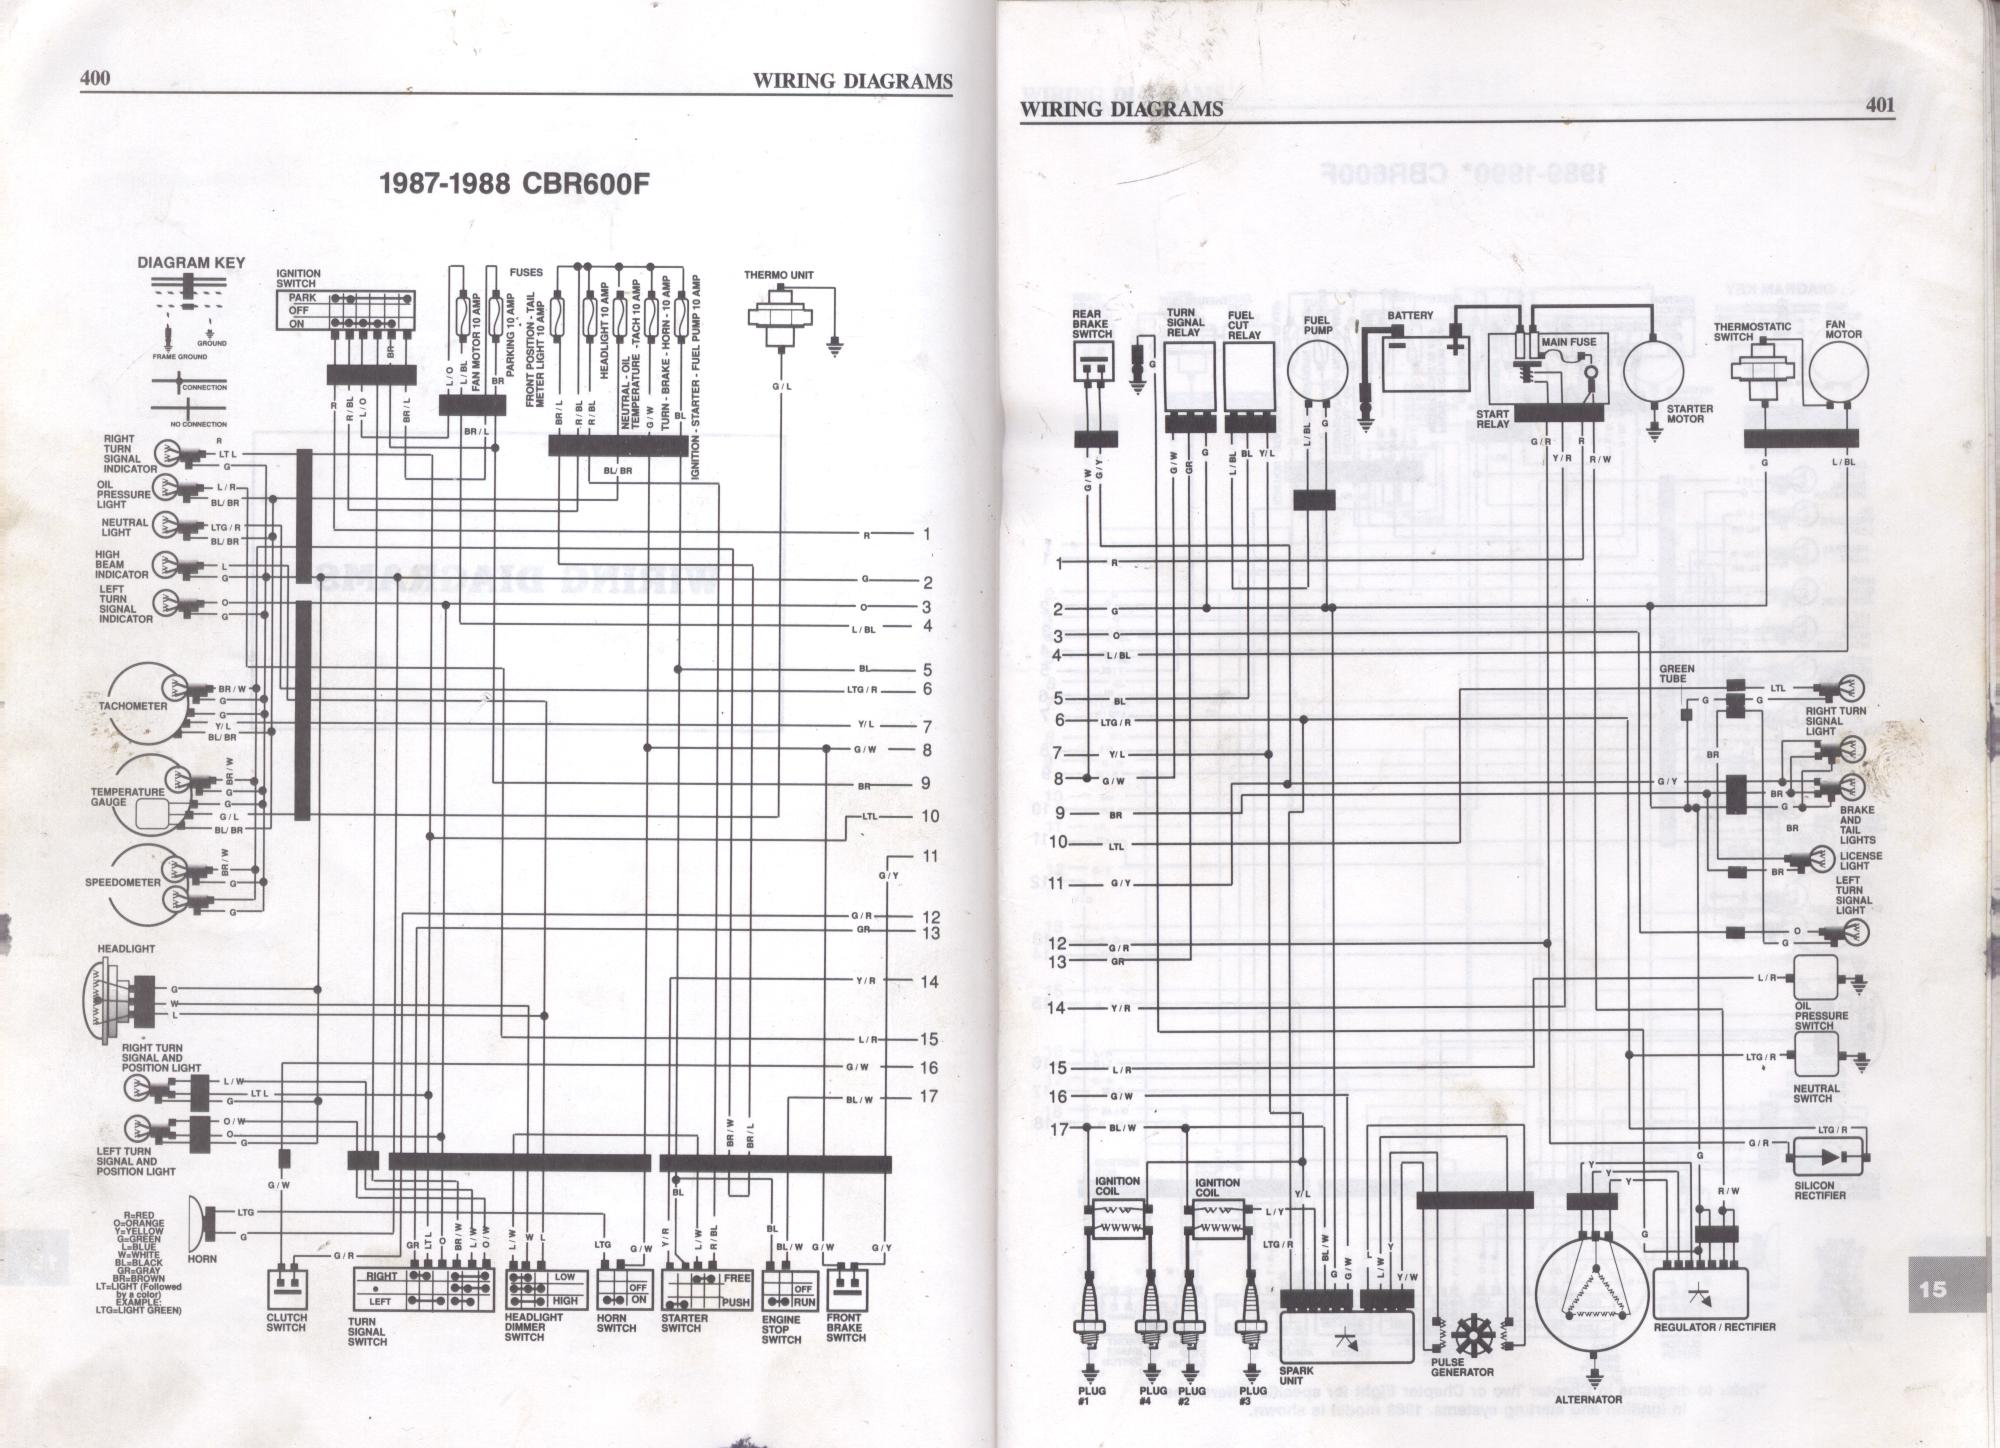 1987 1988 Honda CBR600F Wiring Diagrams?resize\\\\\\\\\\\\\\\\\\\\\\\\\\\\\\=665%2C481 100 [ 2005 2009 and 2011 2012 yamaha ttr230 service repair manual YZ450F at soozxer.org